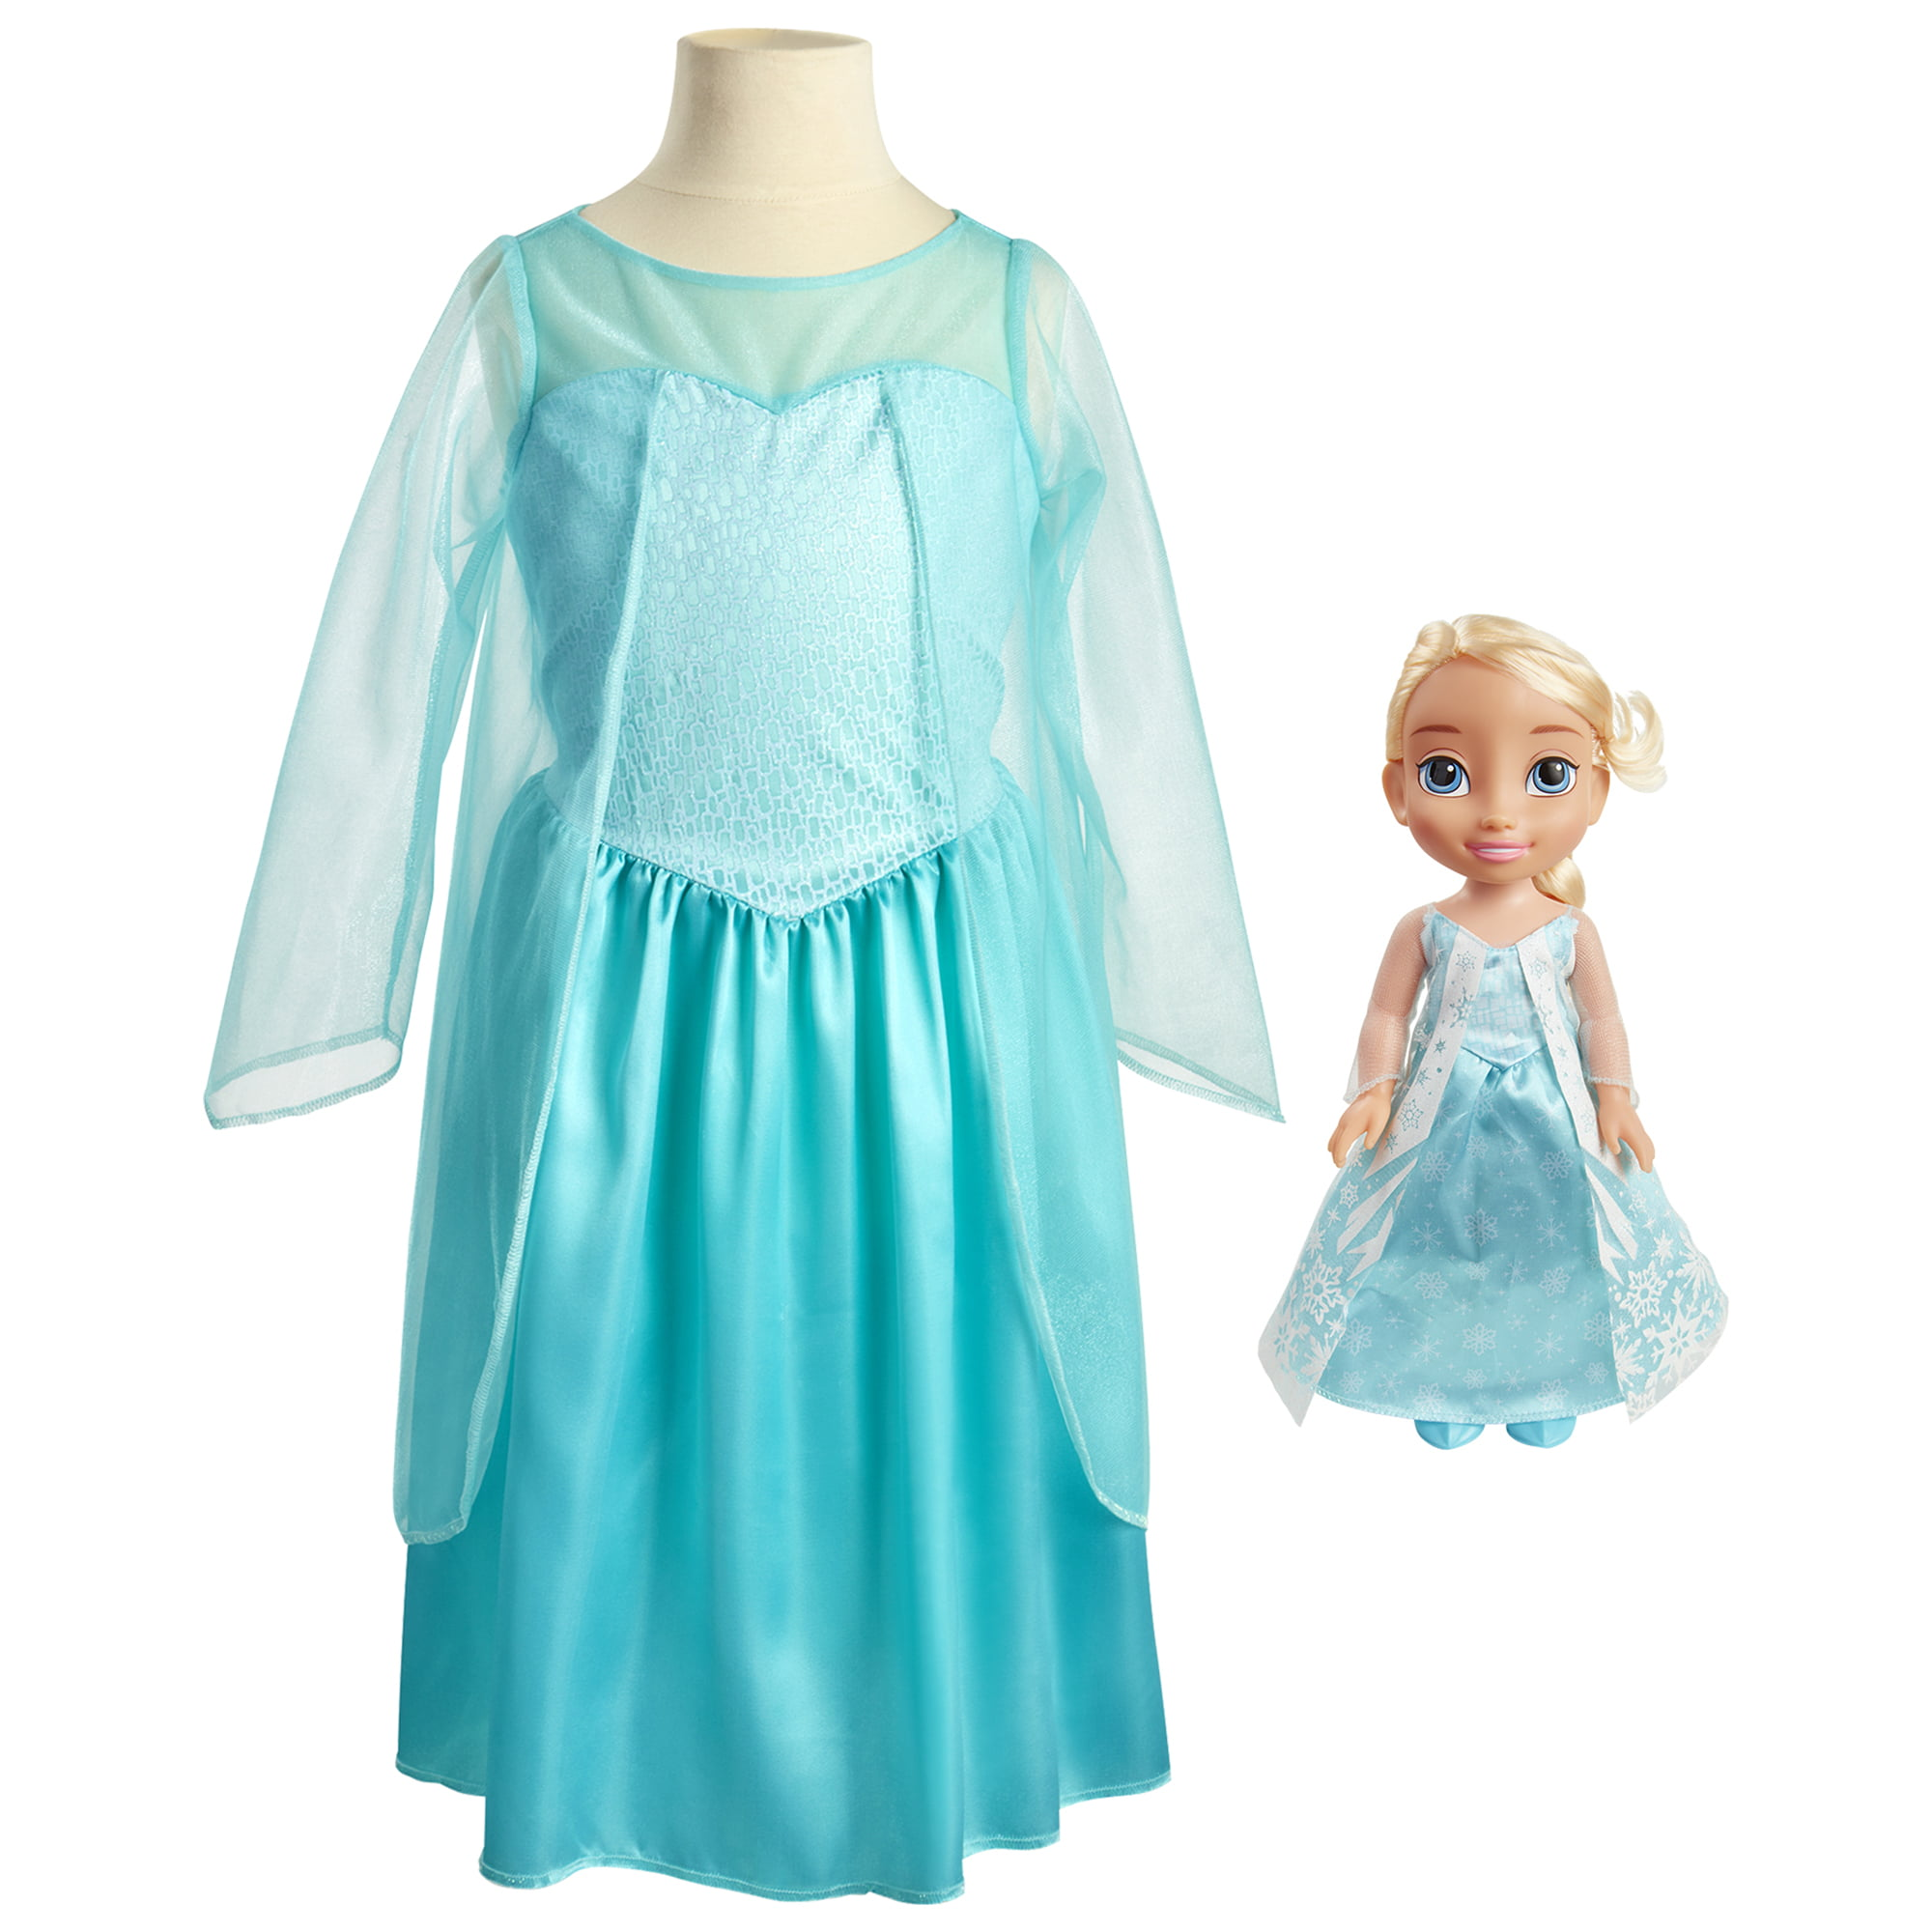 Disney Frozen Elsa Toddler Doll and Dress